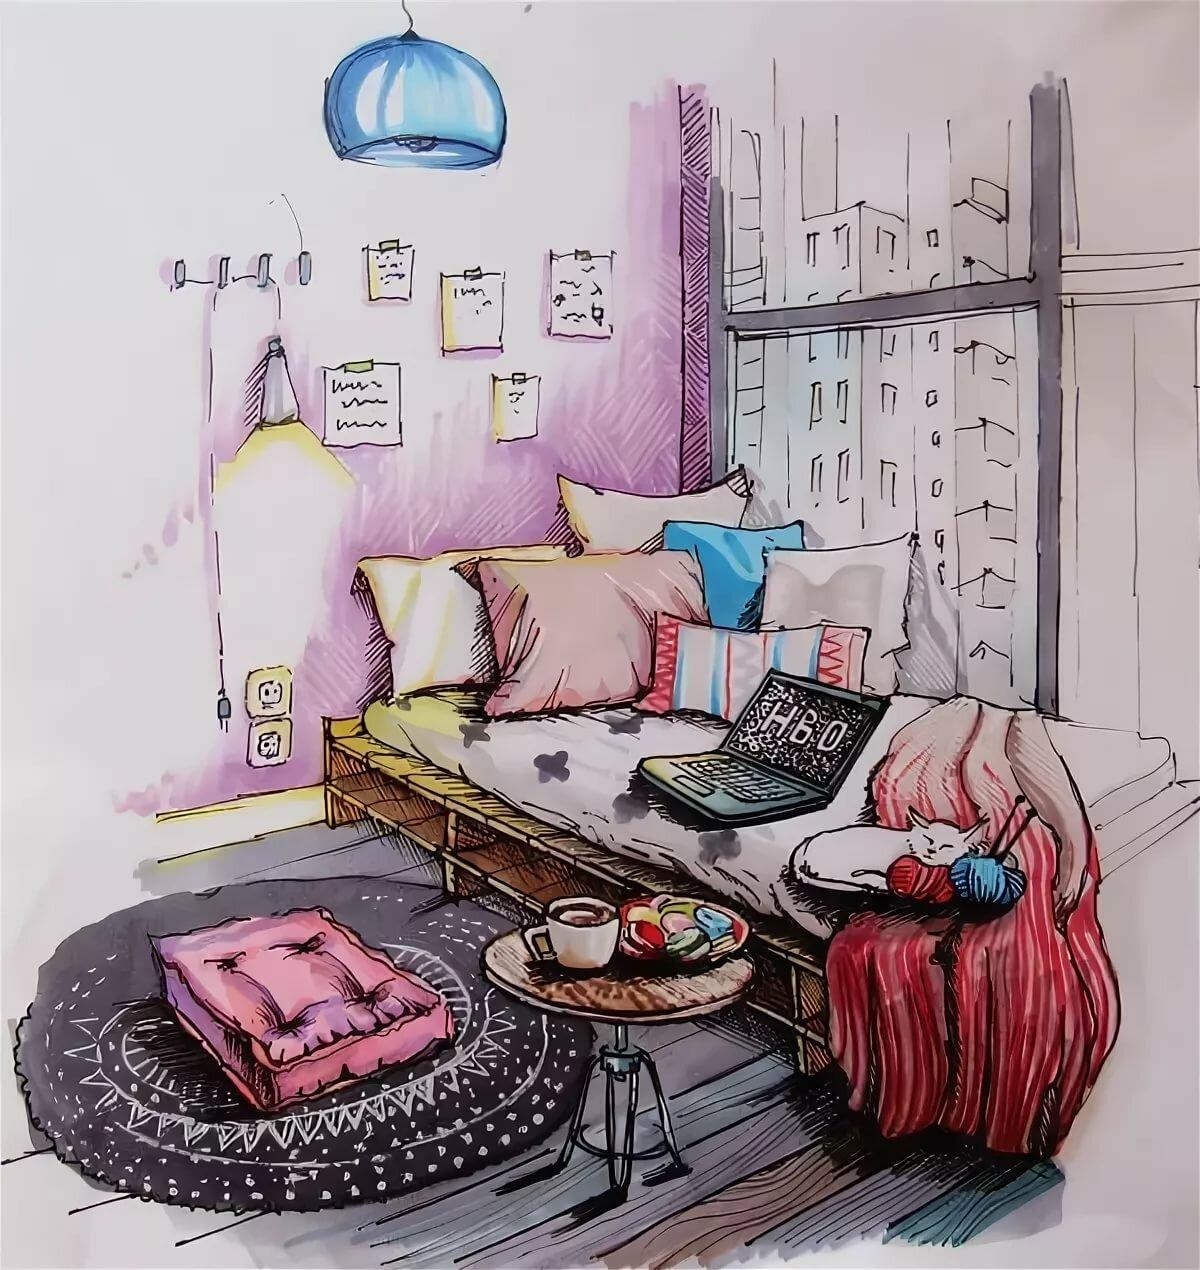 Нарисованные картинки домашних условиях